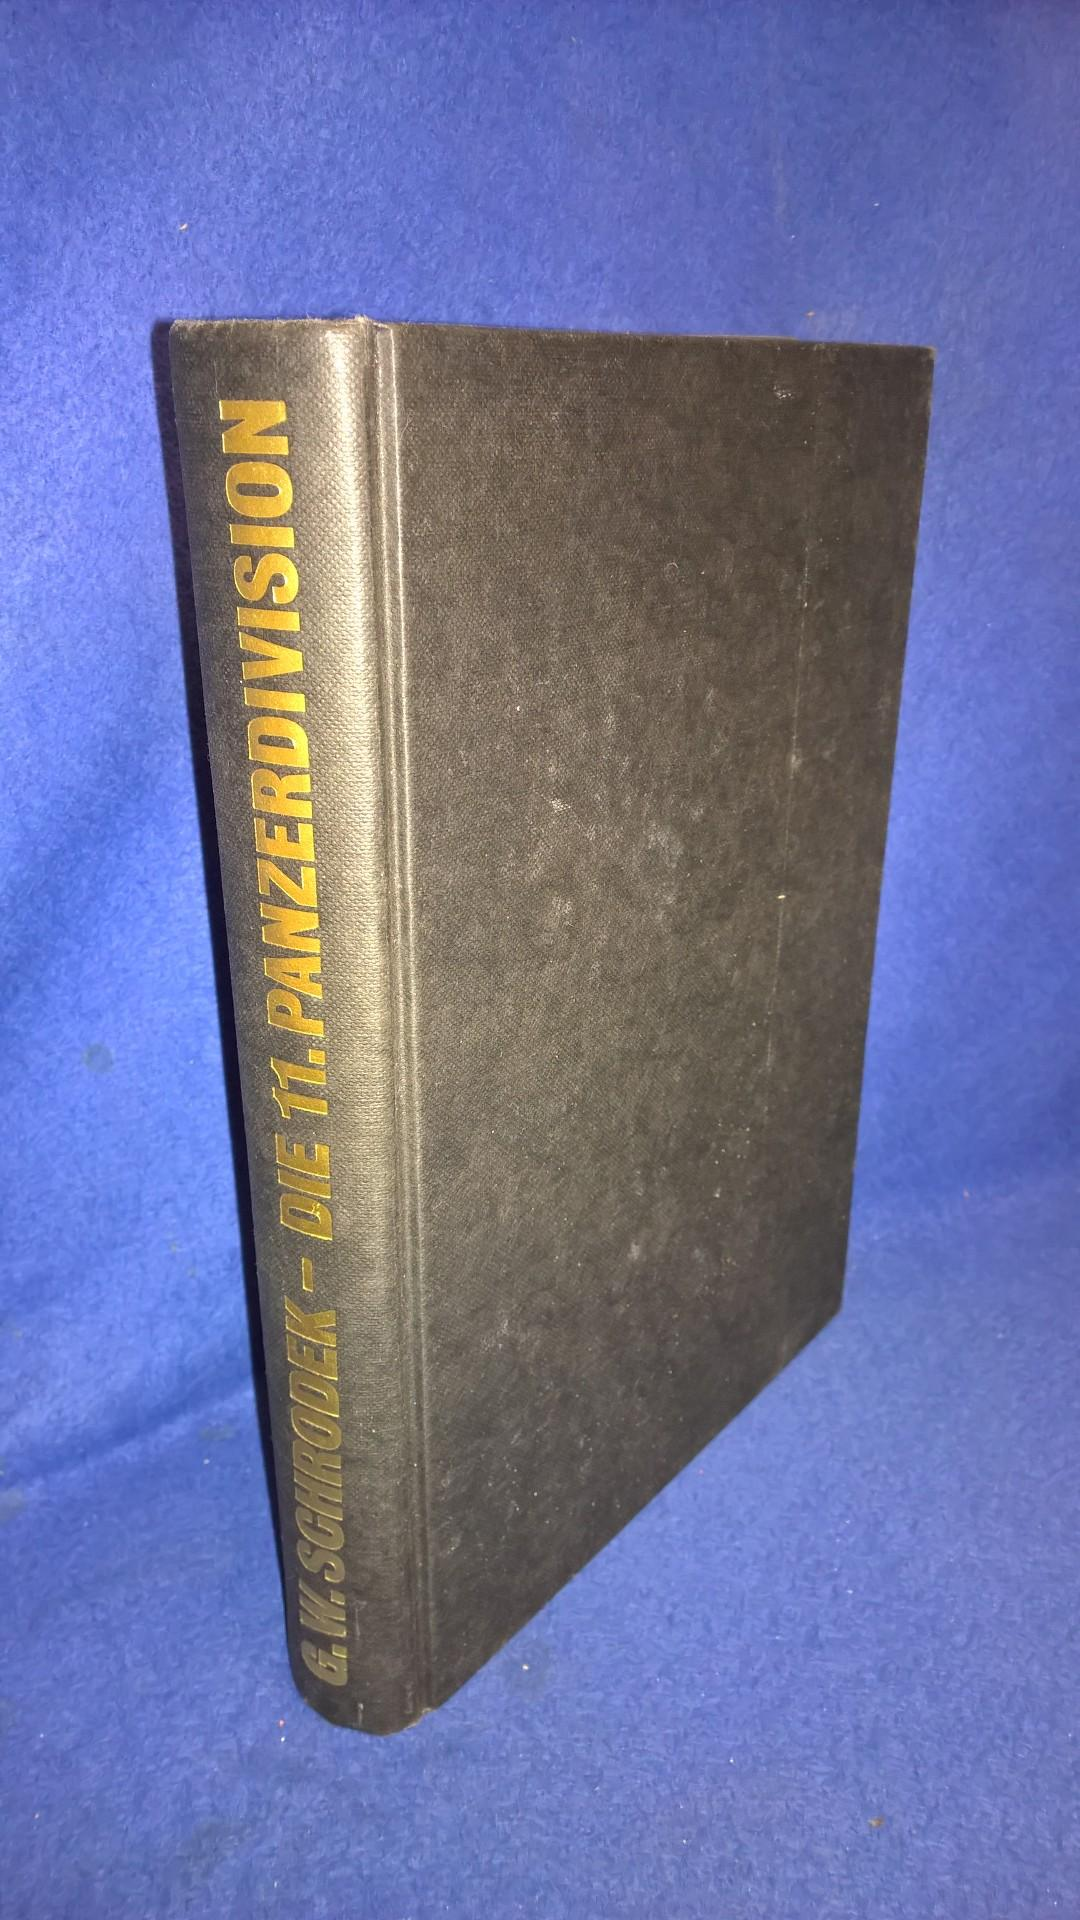 "Die 11. Panzerdivision. ""Gespensterdivision"" Bilddokumente 1940-1945."